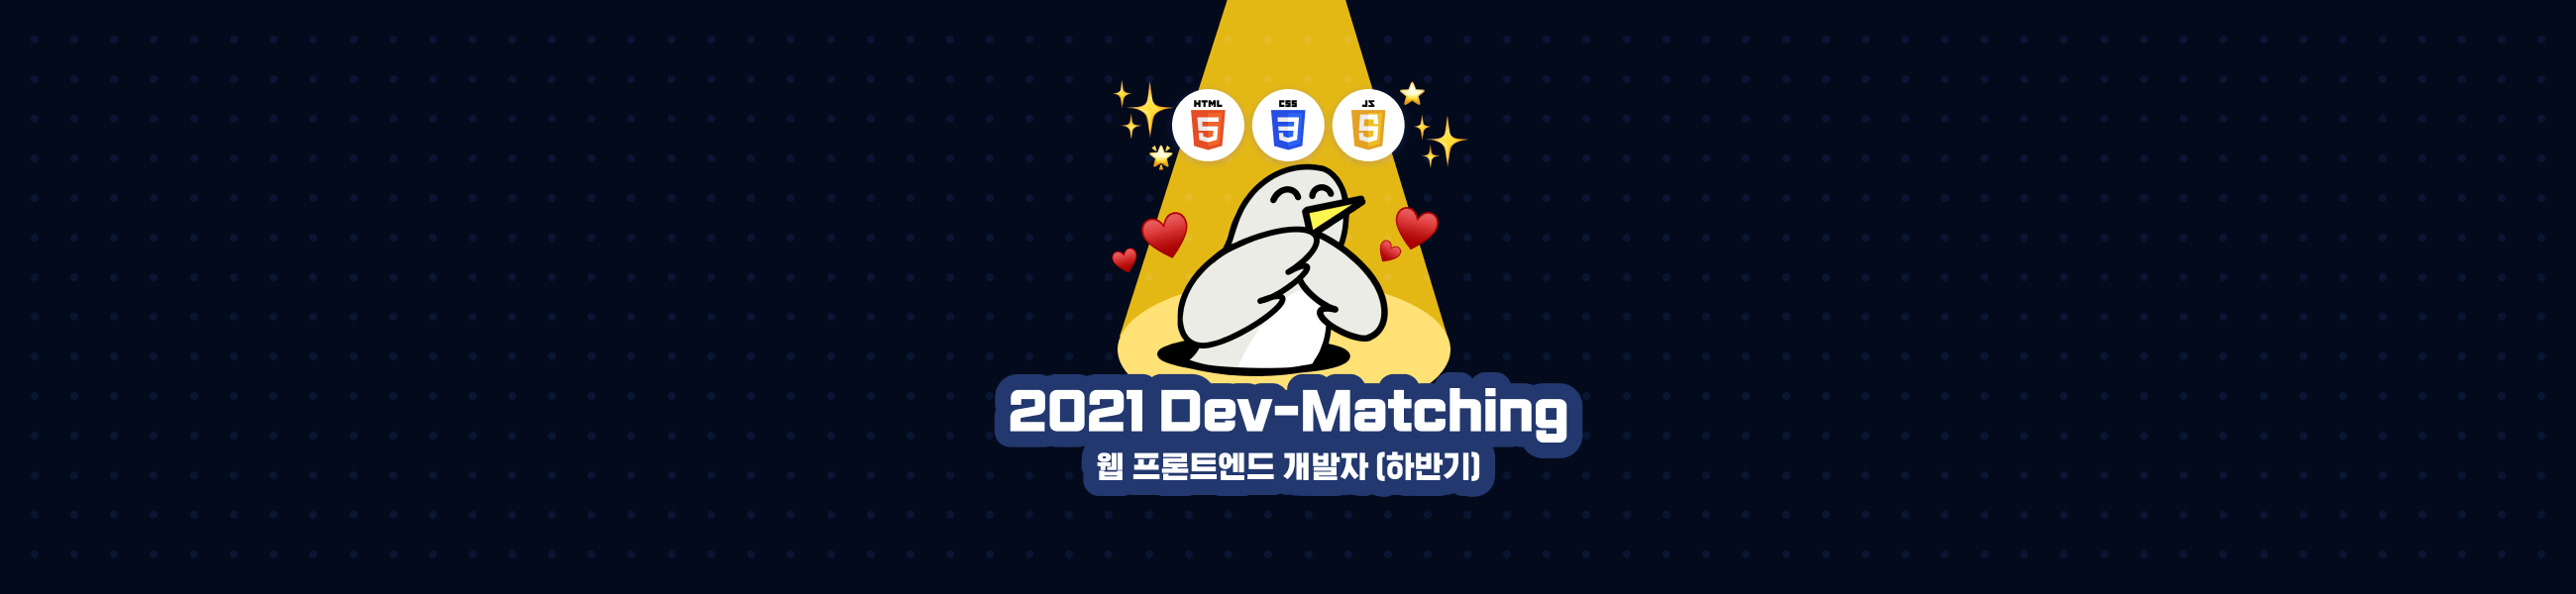 2021 Dev-Matching: 웹 프론트엔드 개발자(하반기)의 이미지